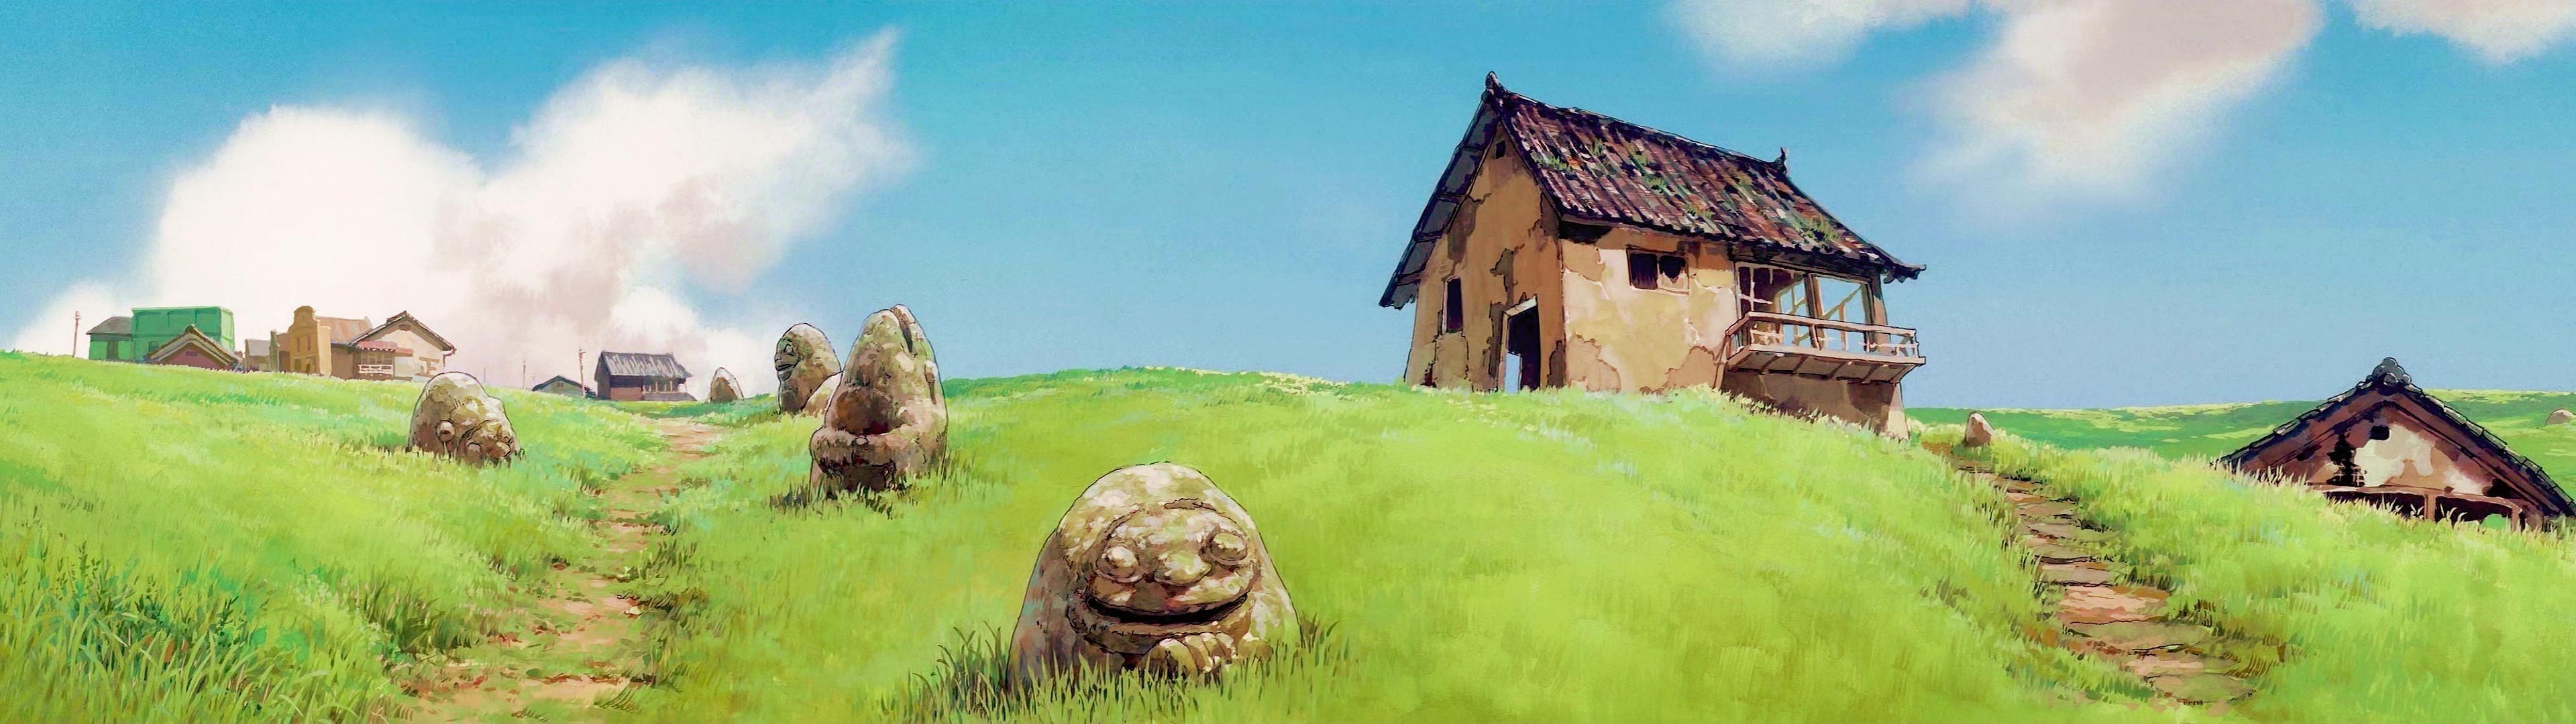 66 Studio Ghibli Wallpapers on WallpaperPlay 3840x1080